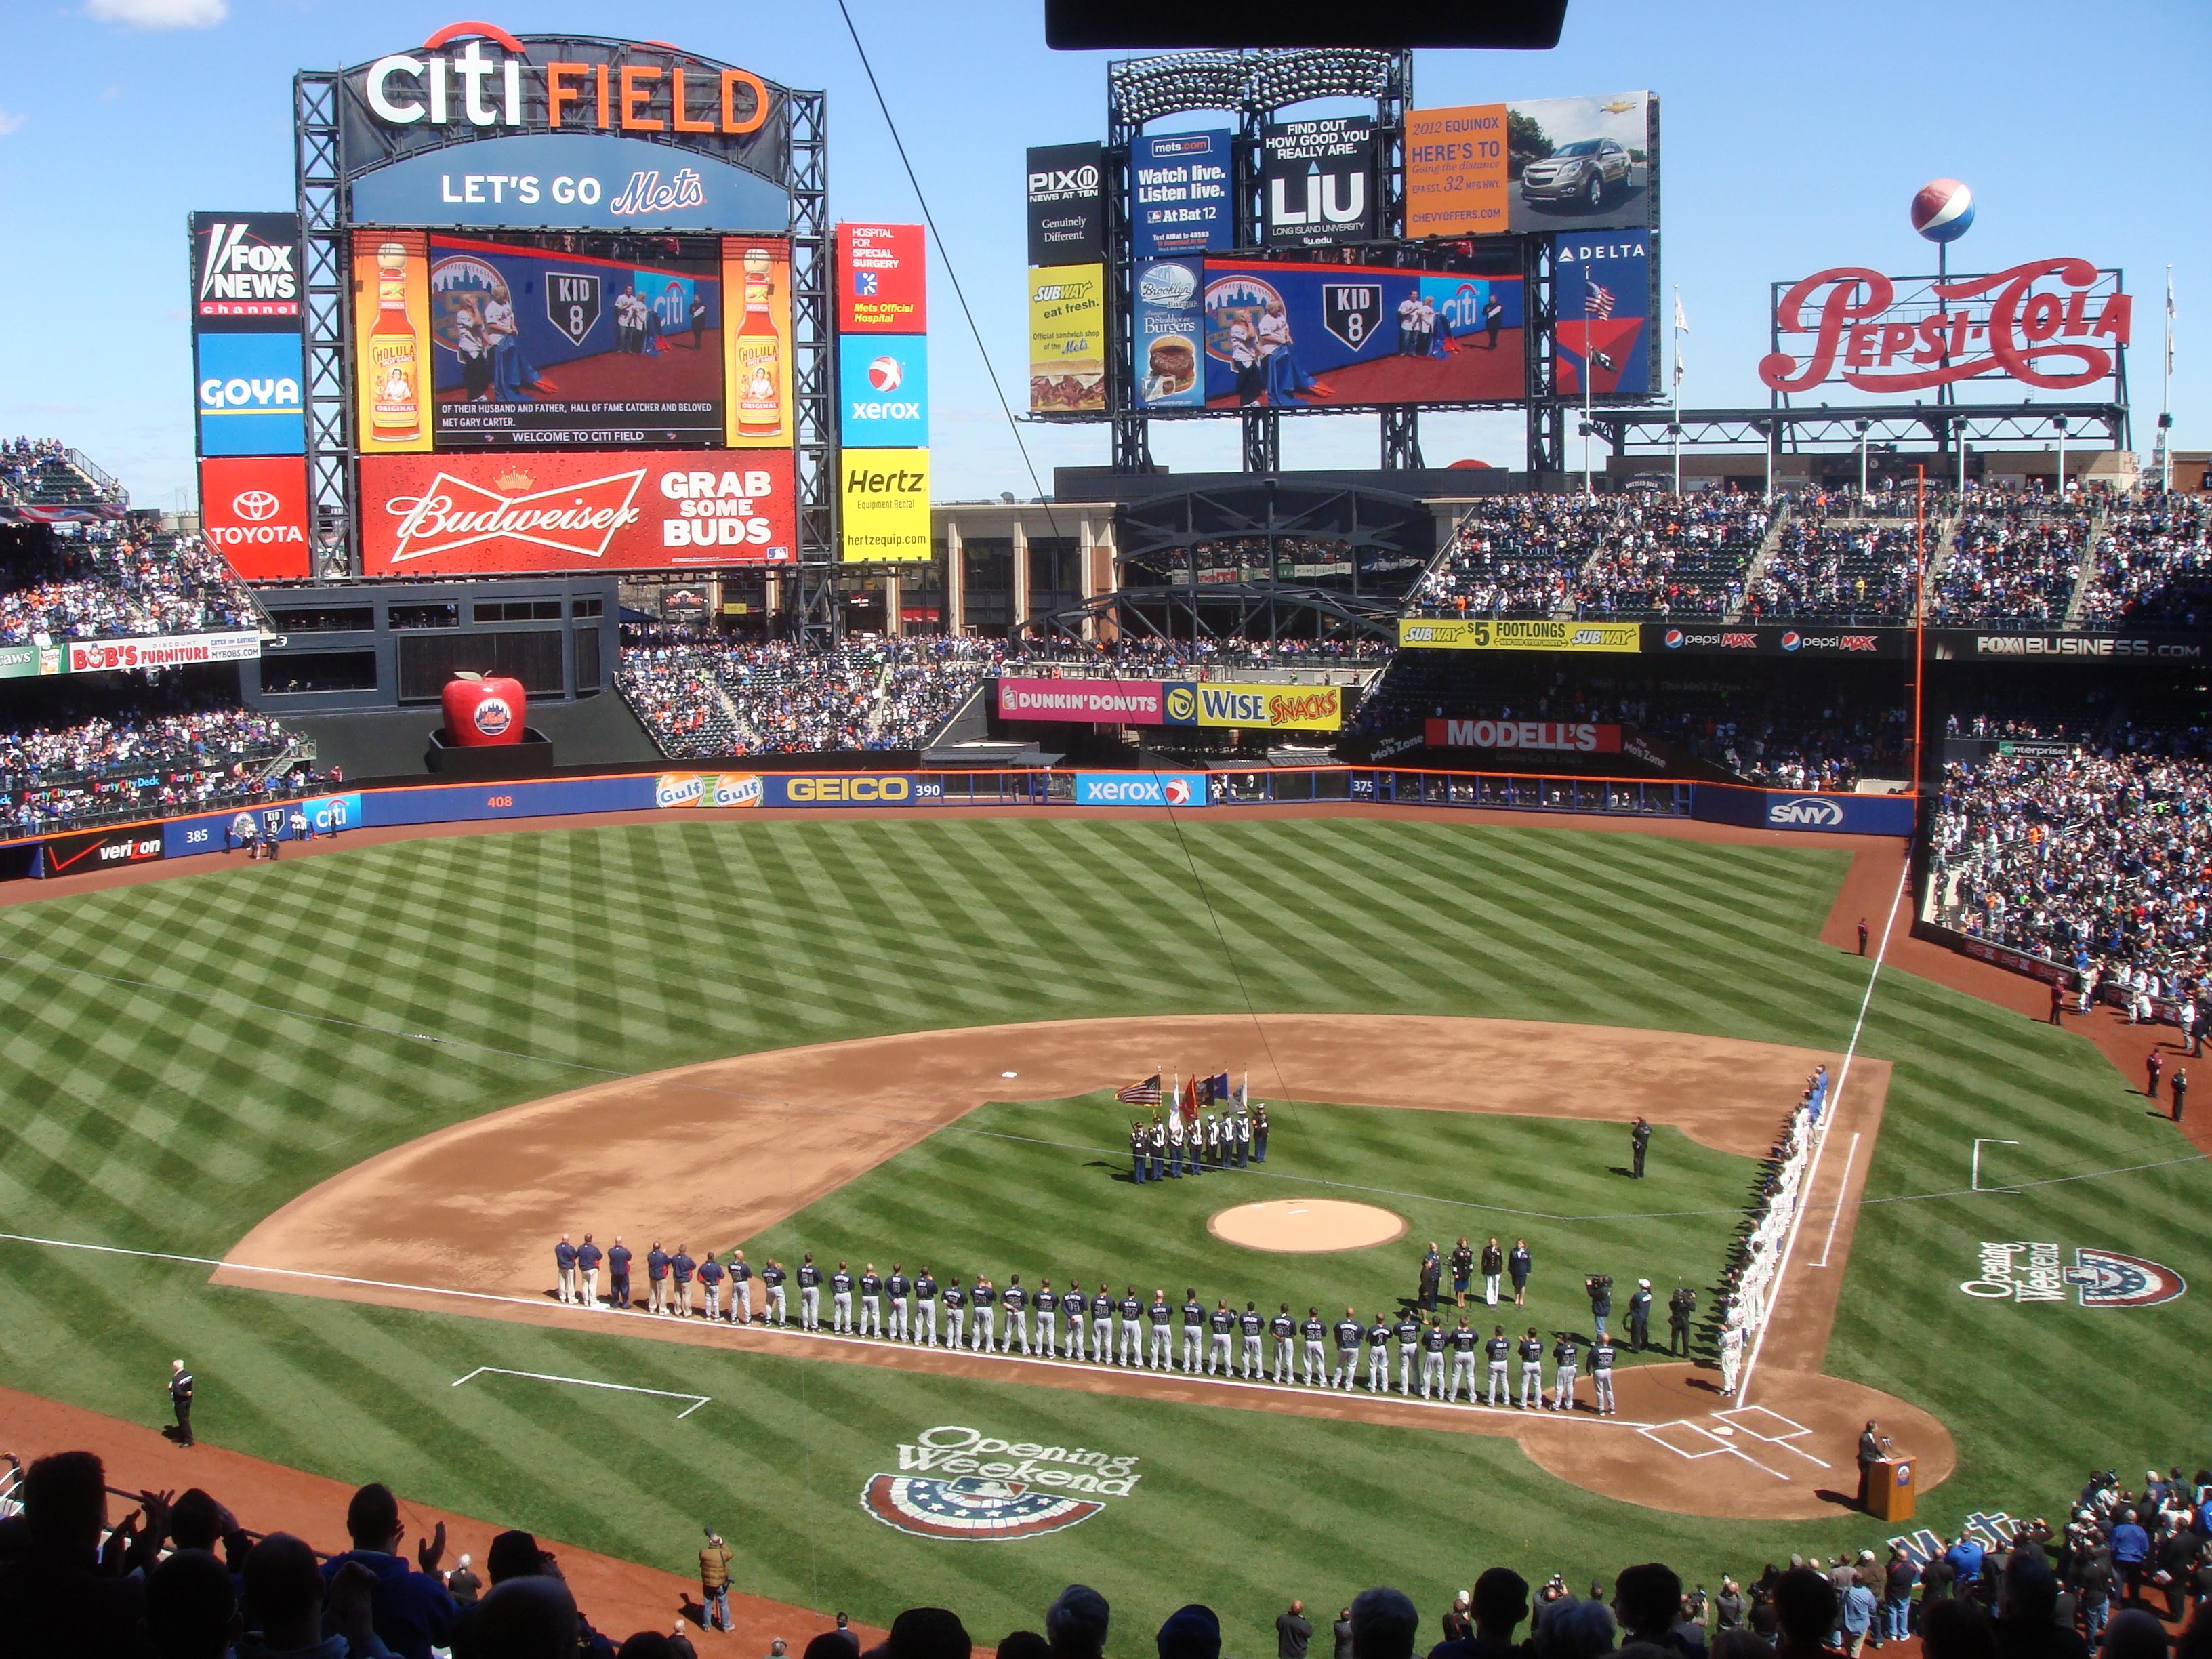 2012 Citi Field   New York Mets   The Happy Recap   New York Mets 3264x2448